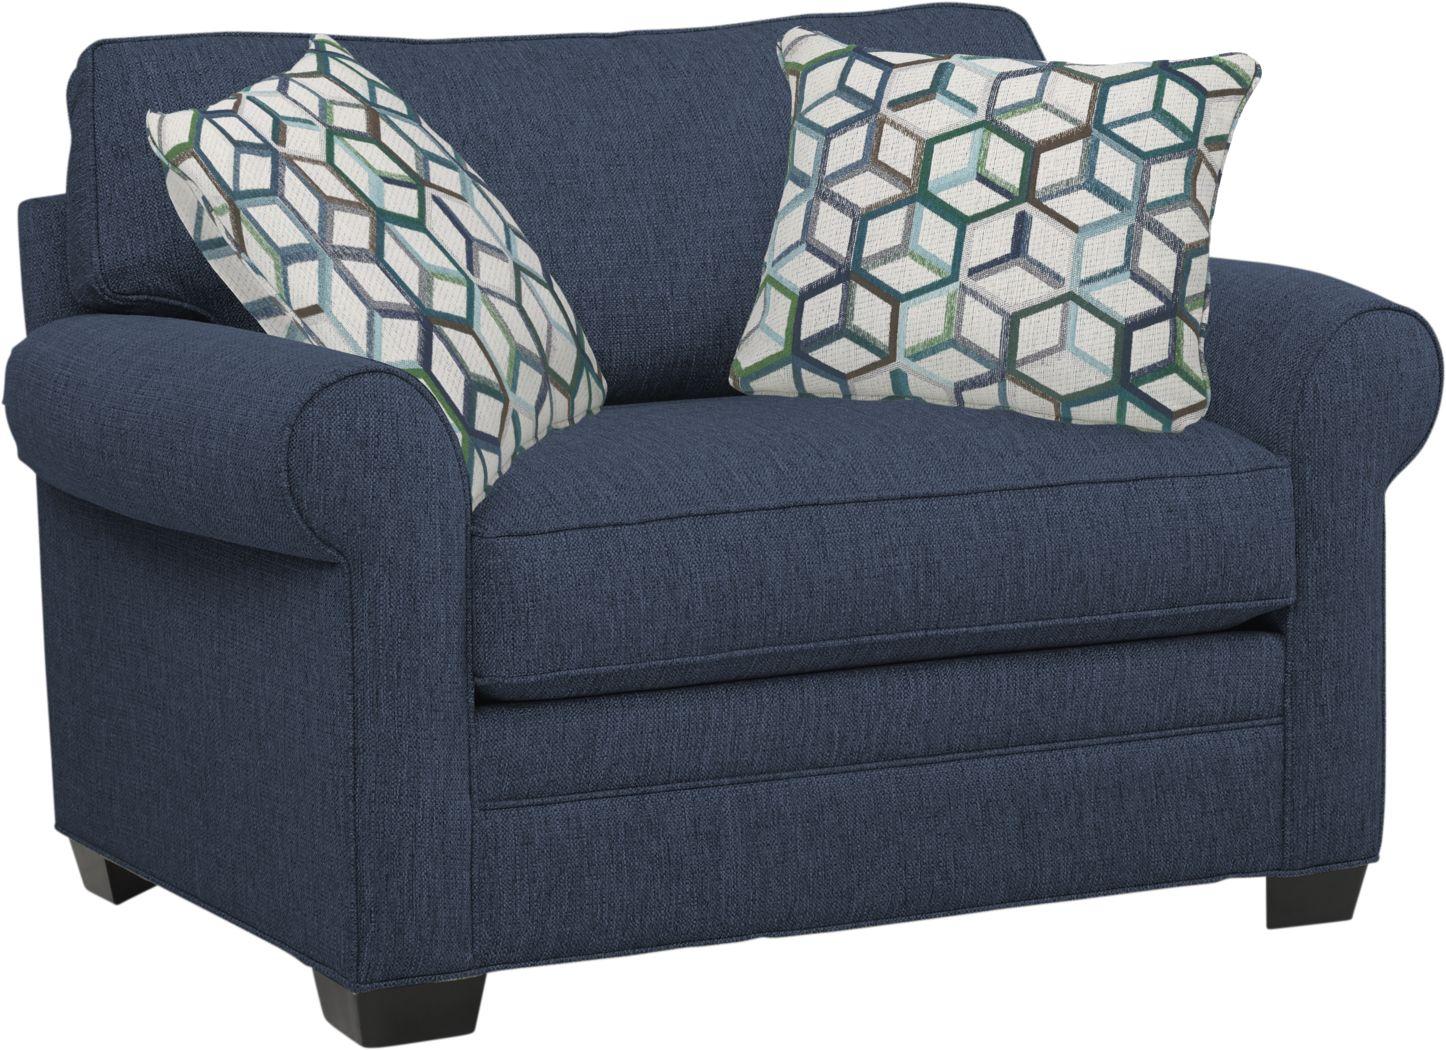 Cindy Crawford Home Bellingham Midnight Textured Gel Foam Sleeper Chair